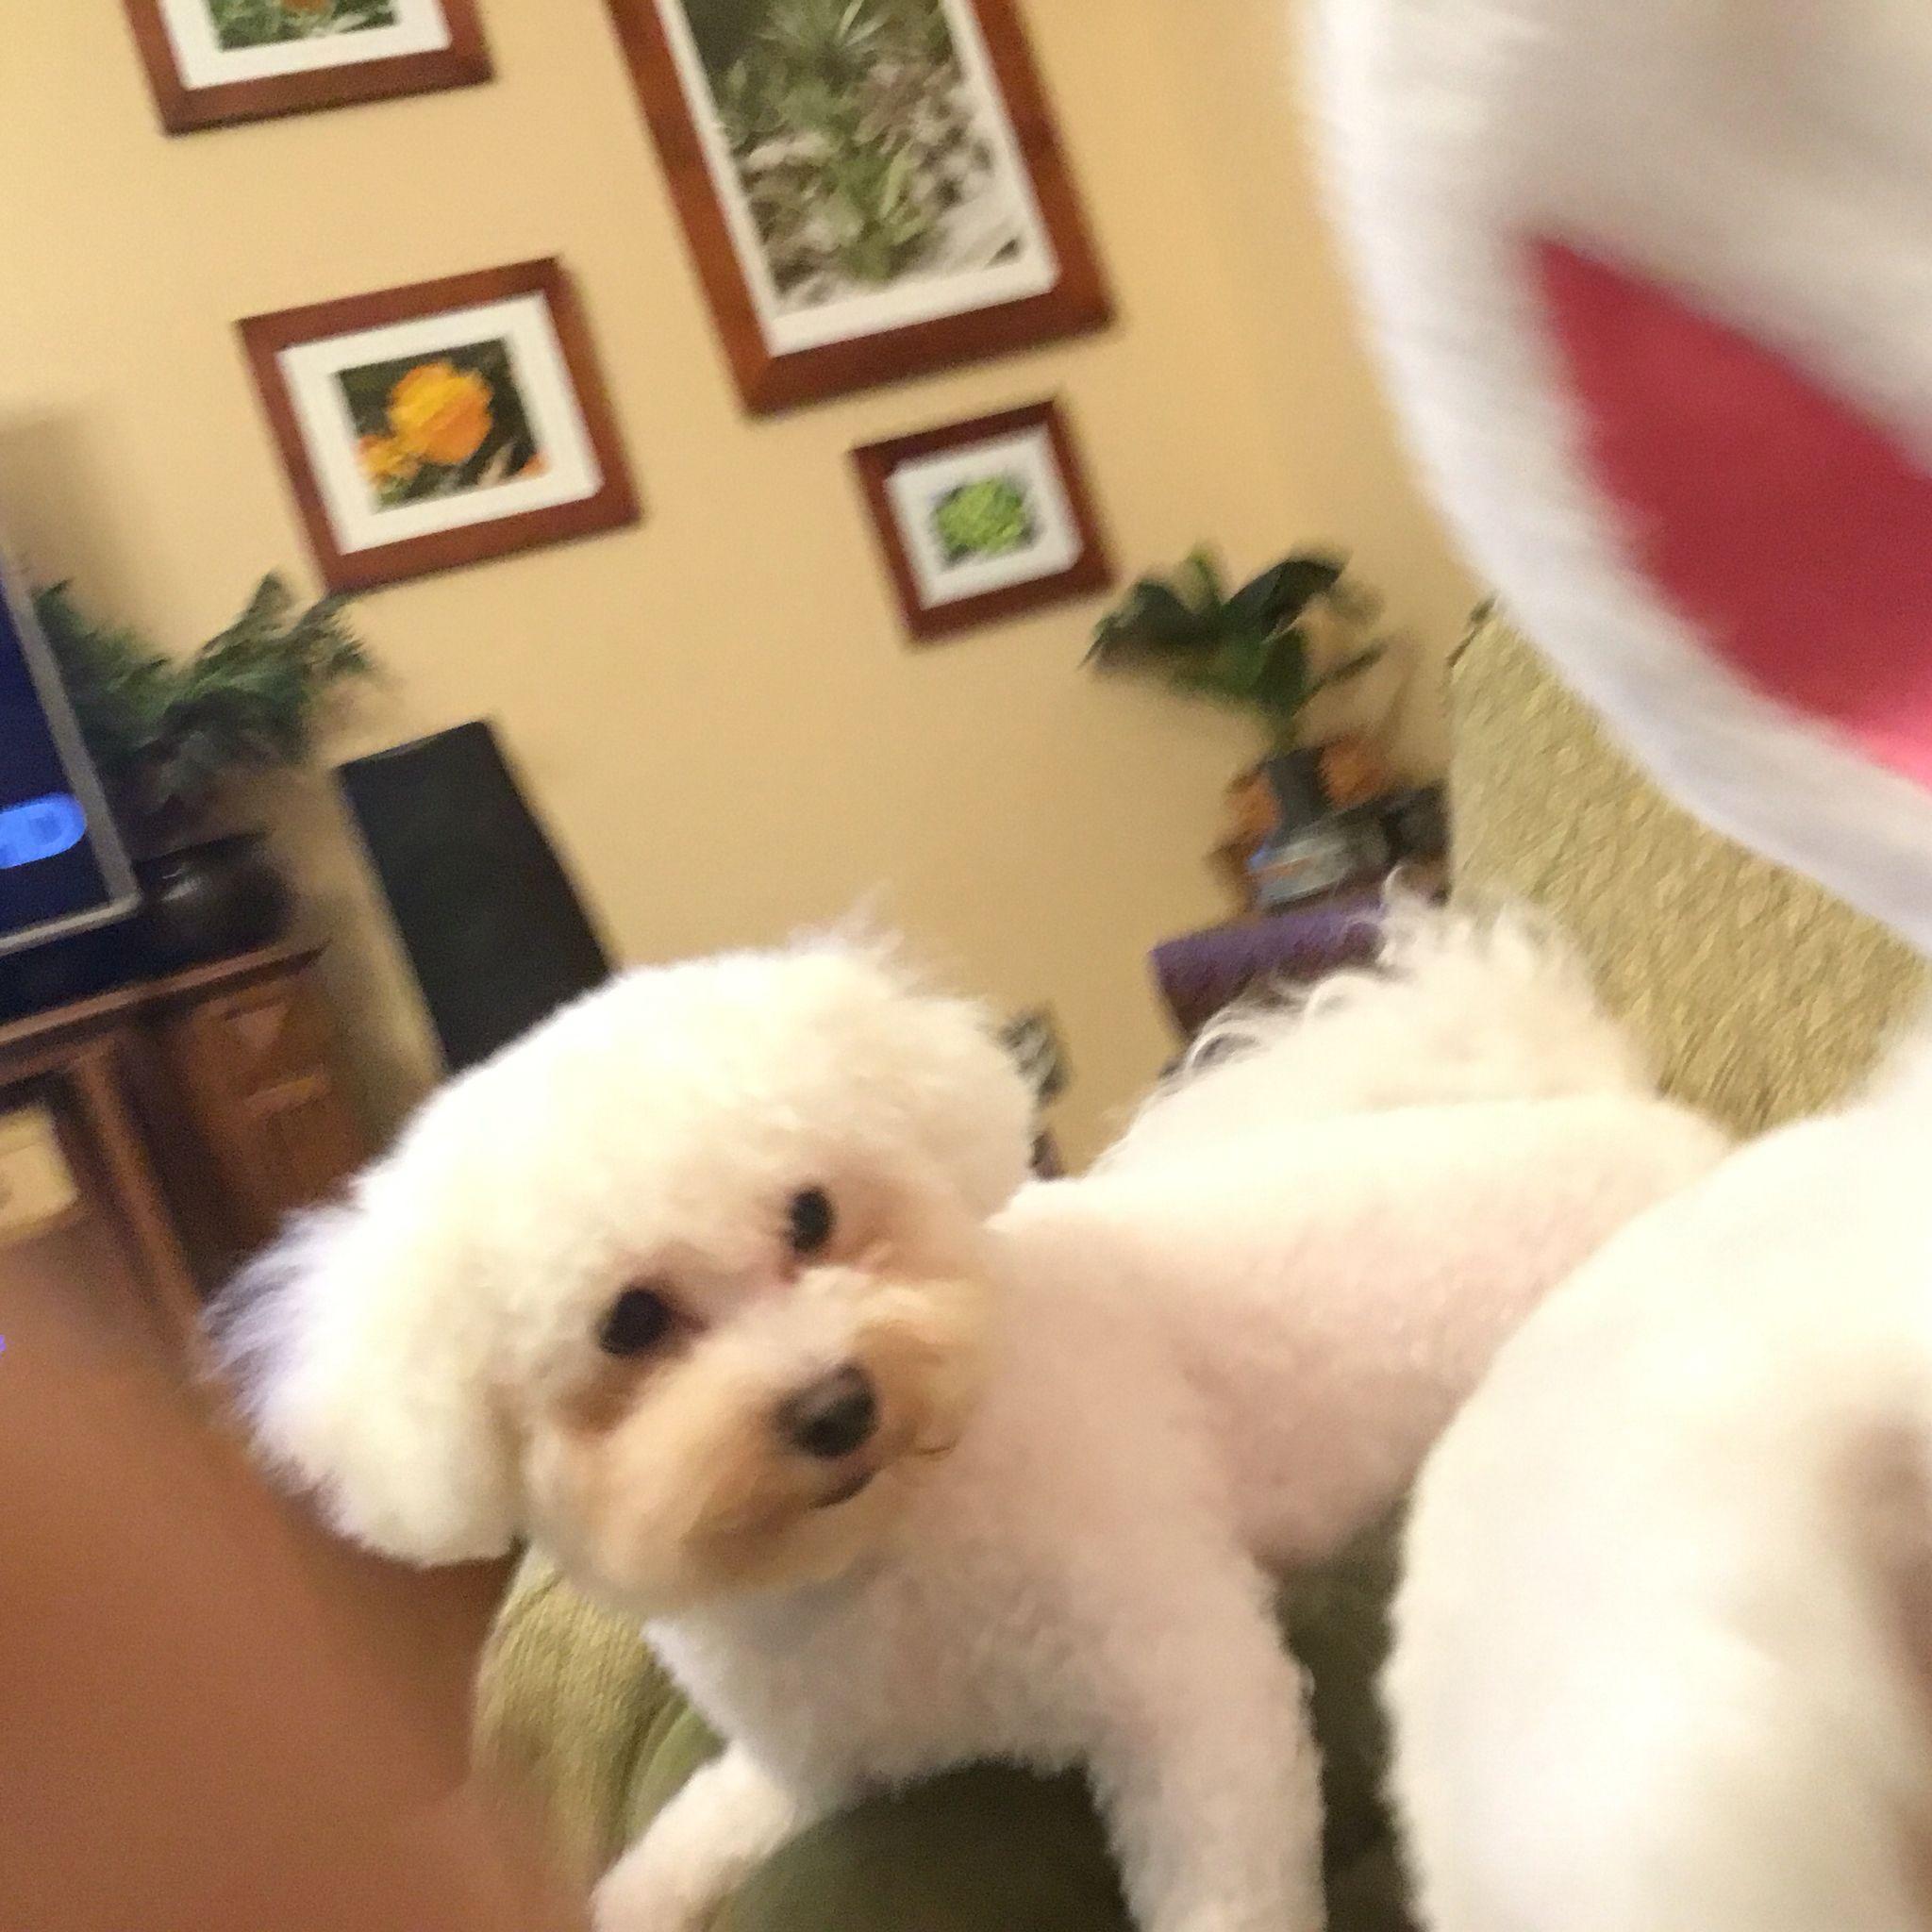 Cotton Girl and dog, Bichon frise, Bichon